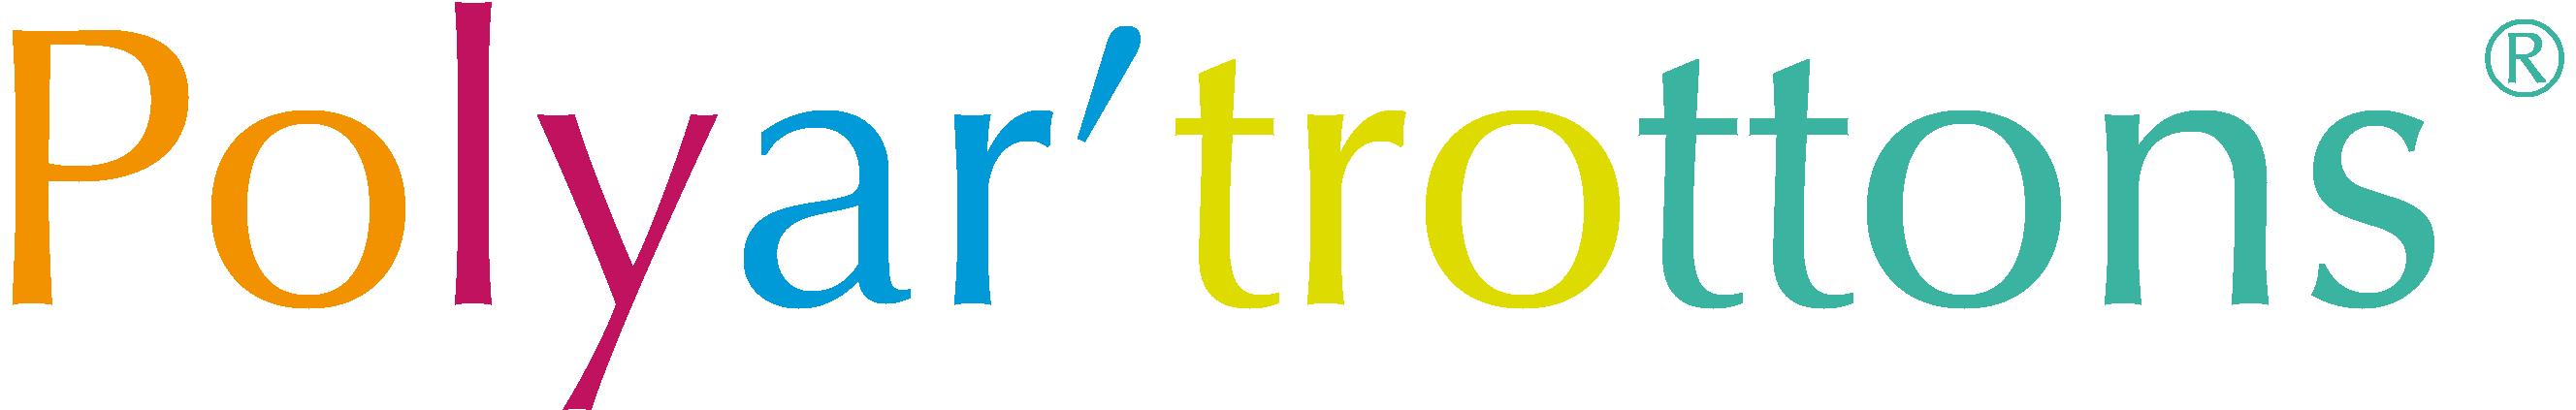 Polyar'trottons